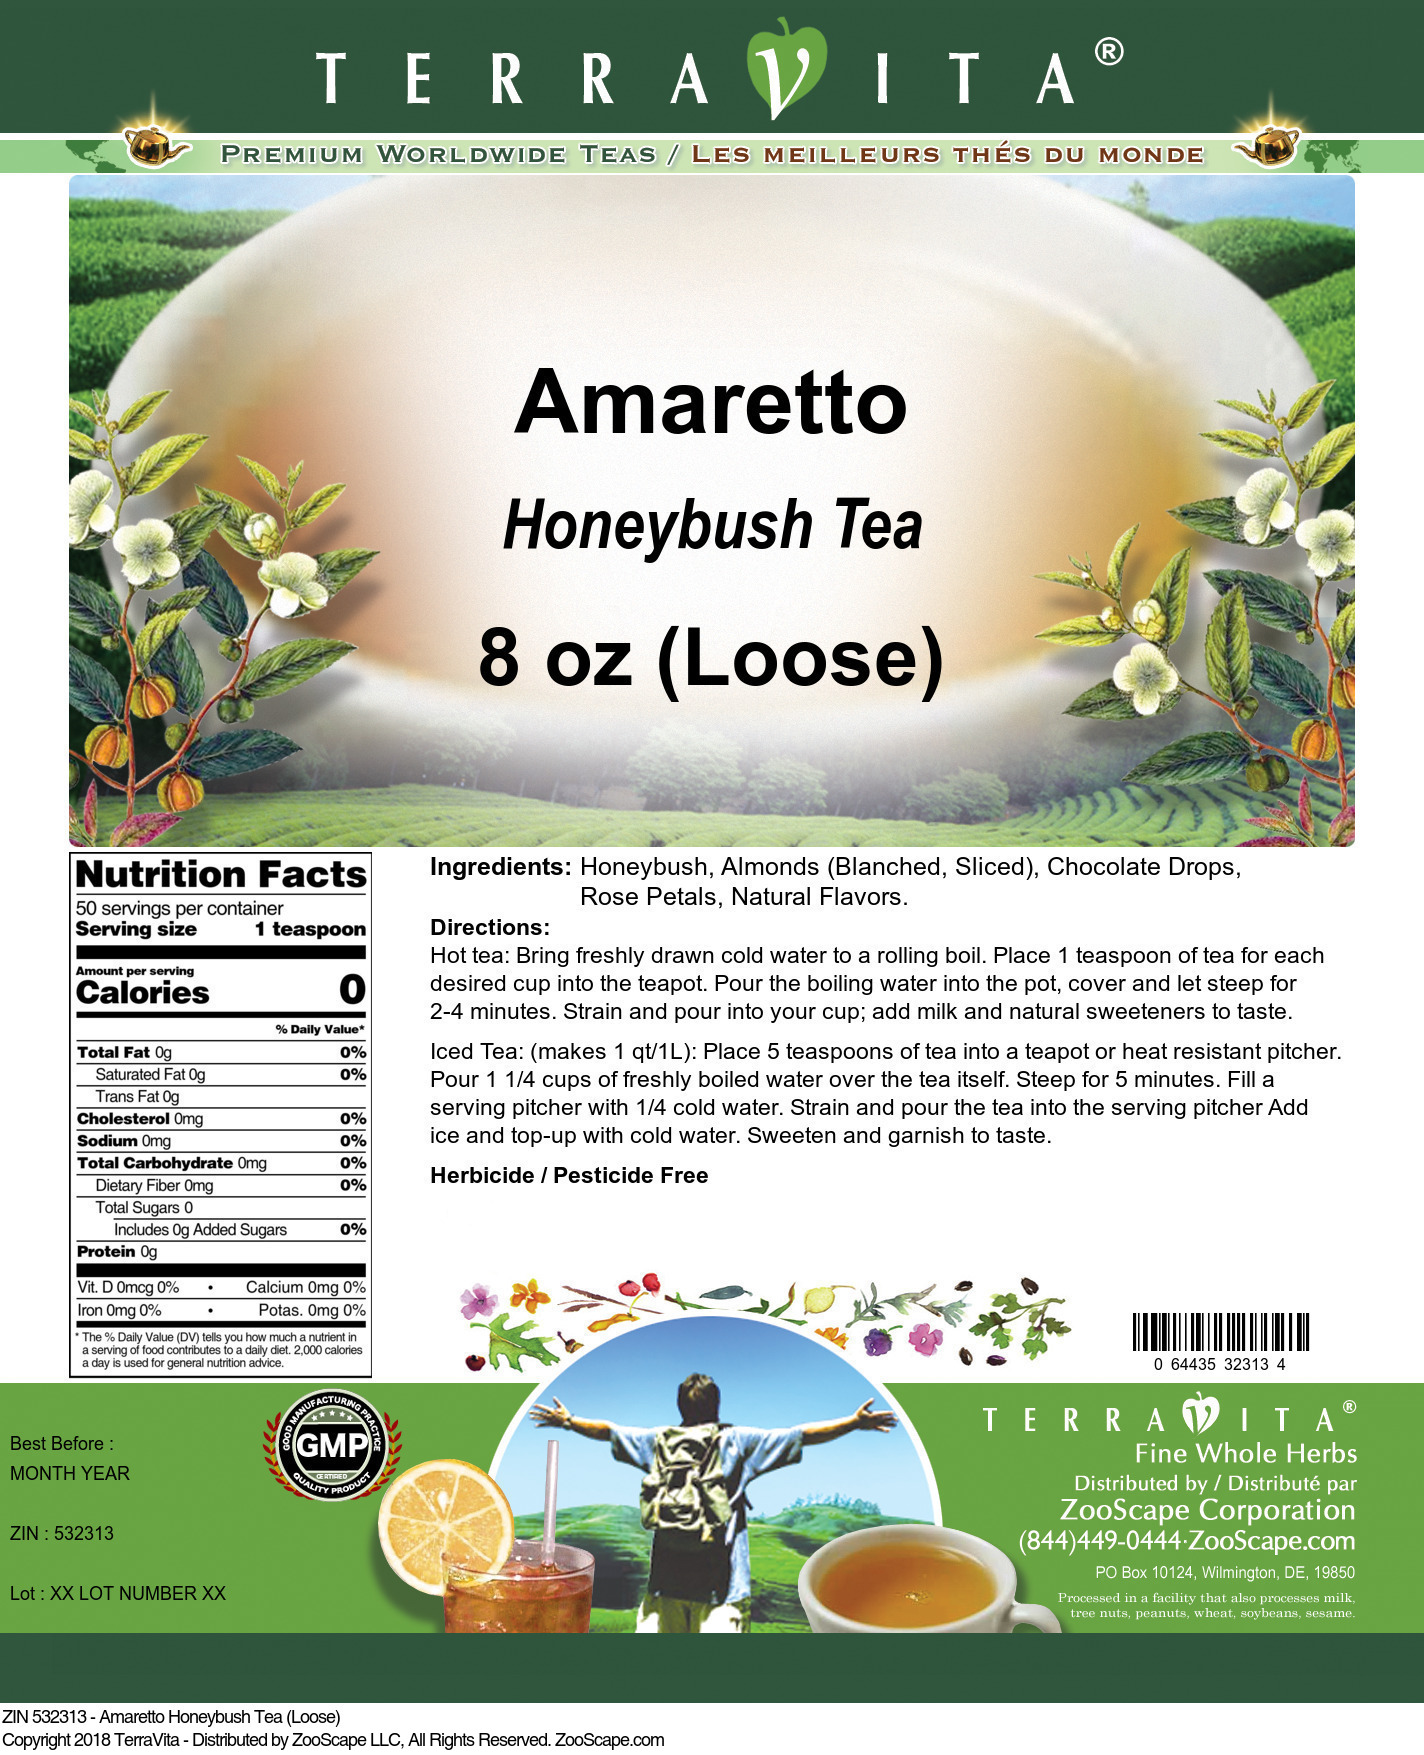 Amaretto Honeybush Tea